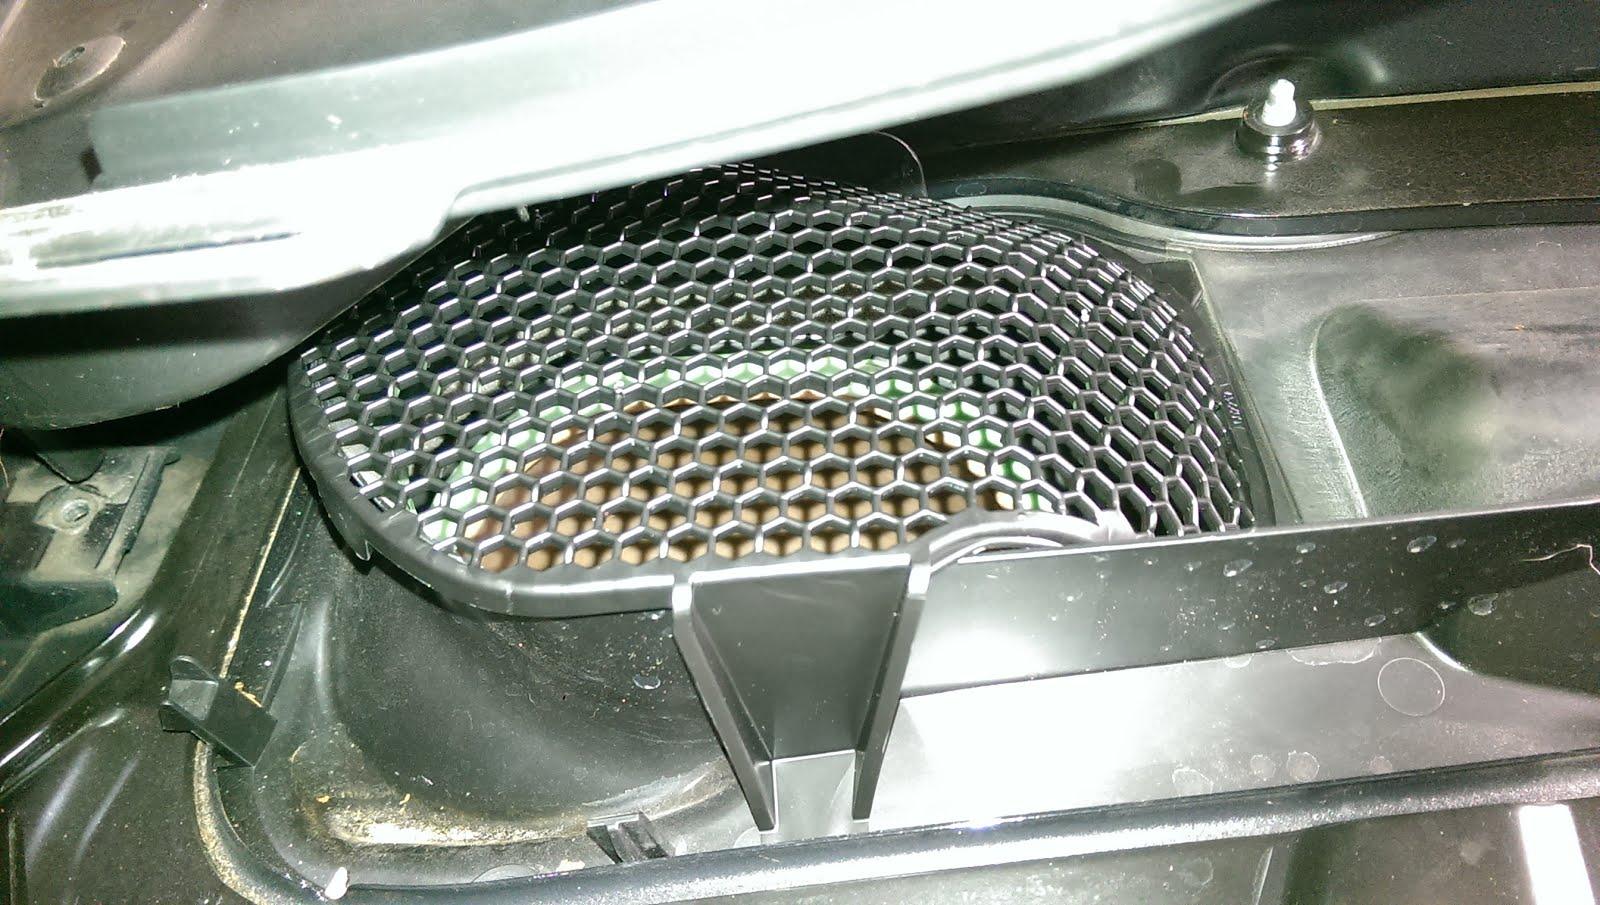 BMW Virtuoso: BMW 3 Series F30 A/C Blower Motor Noise